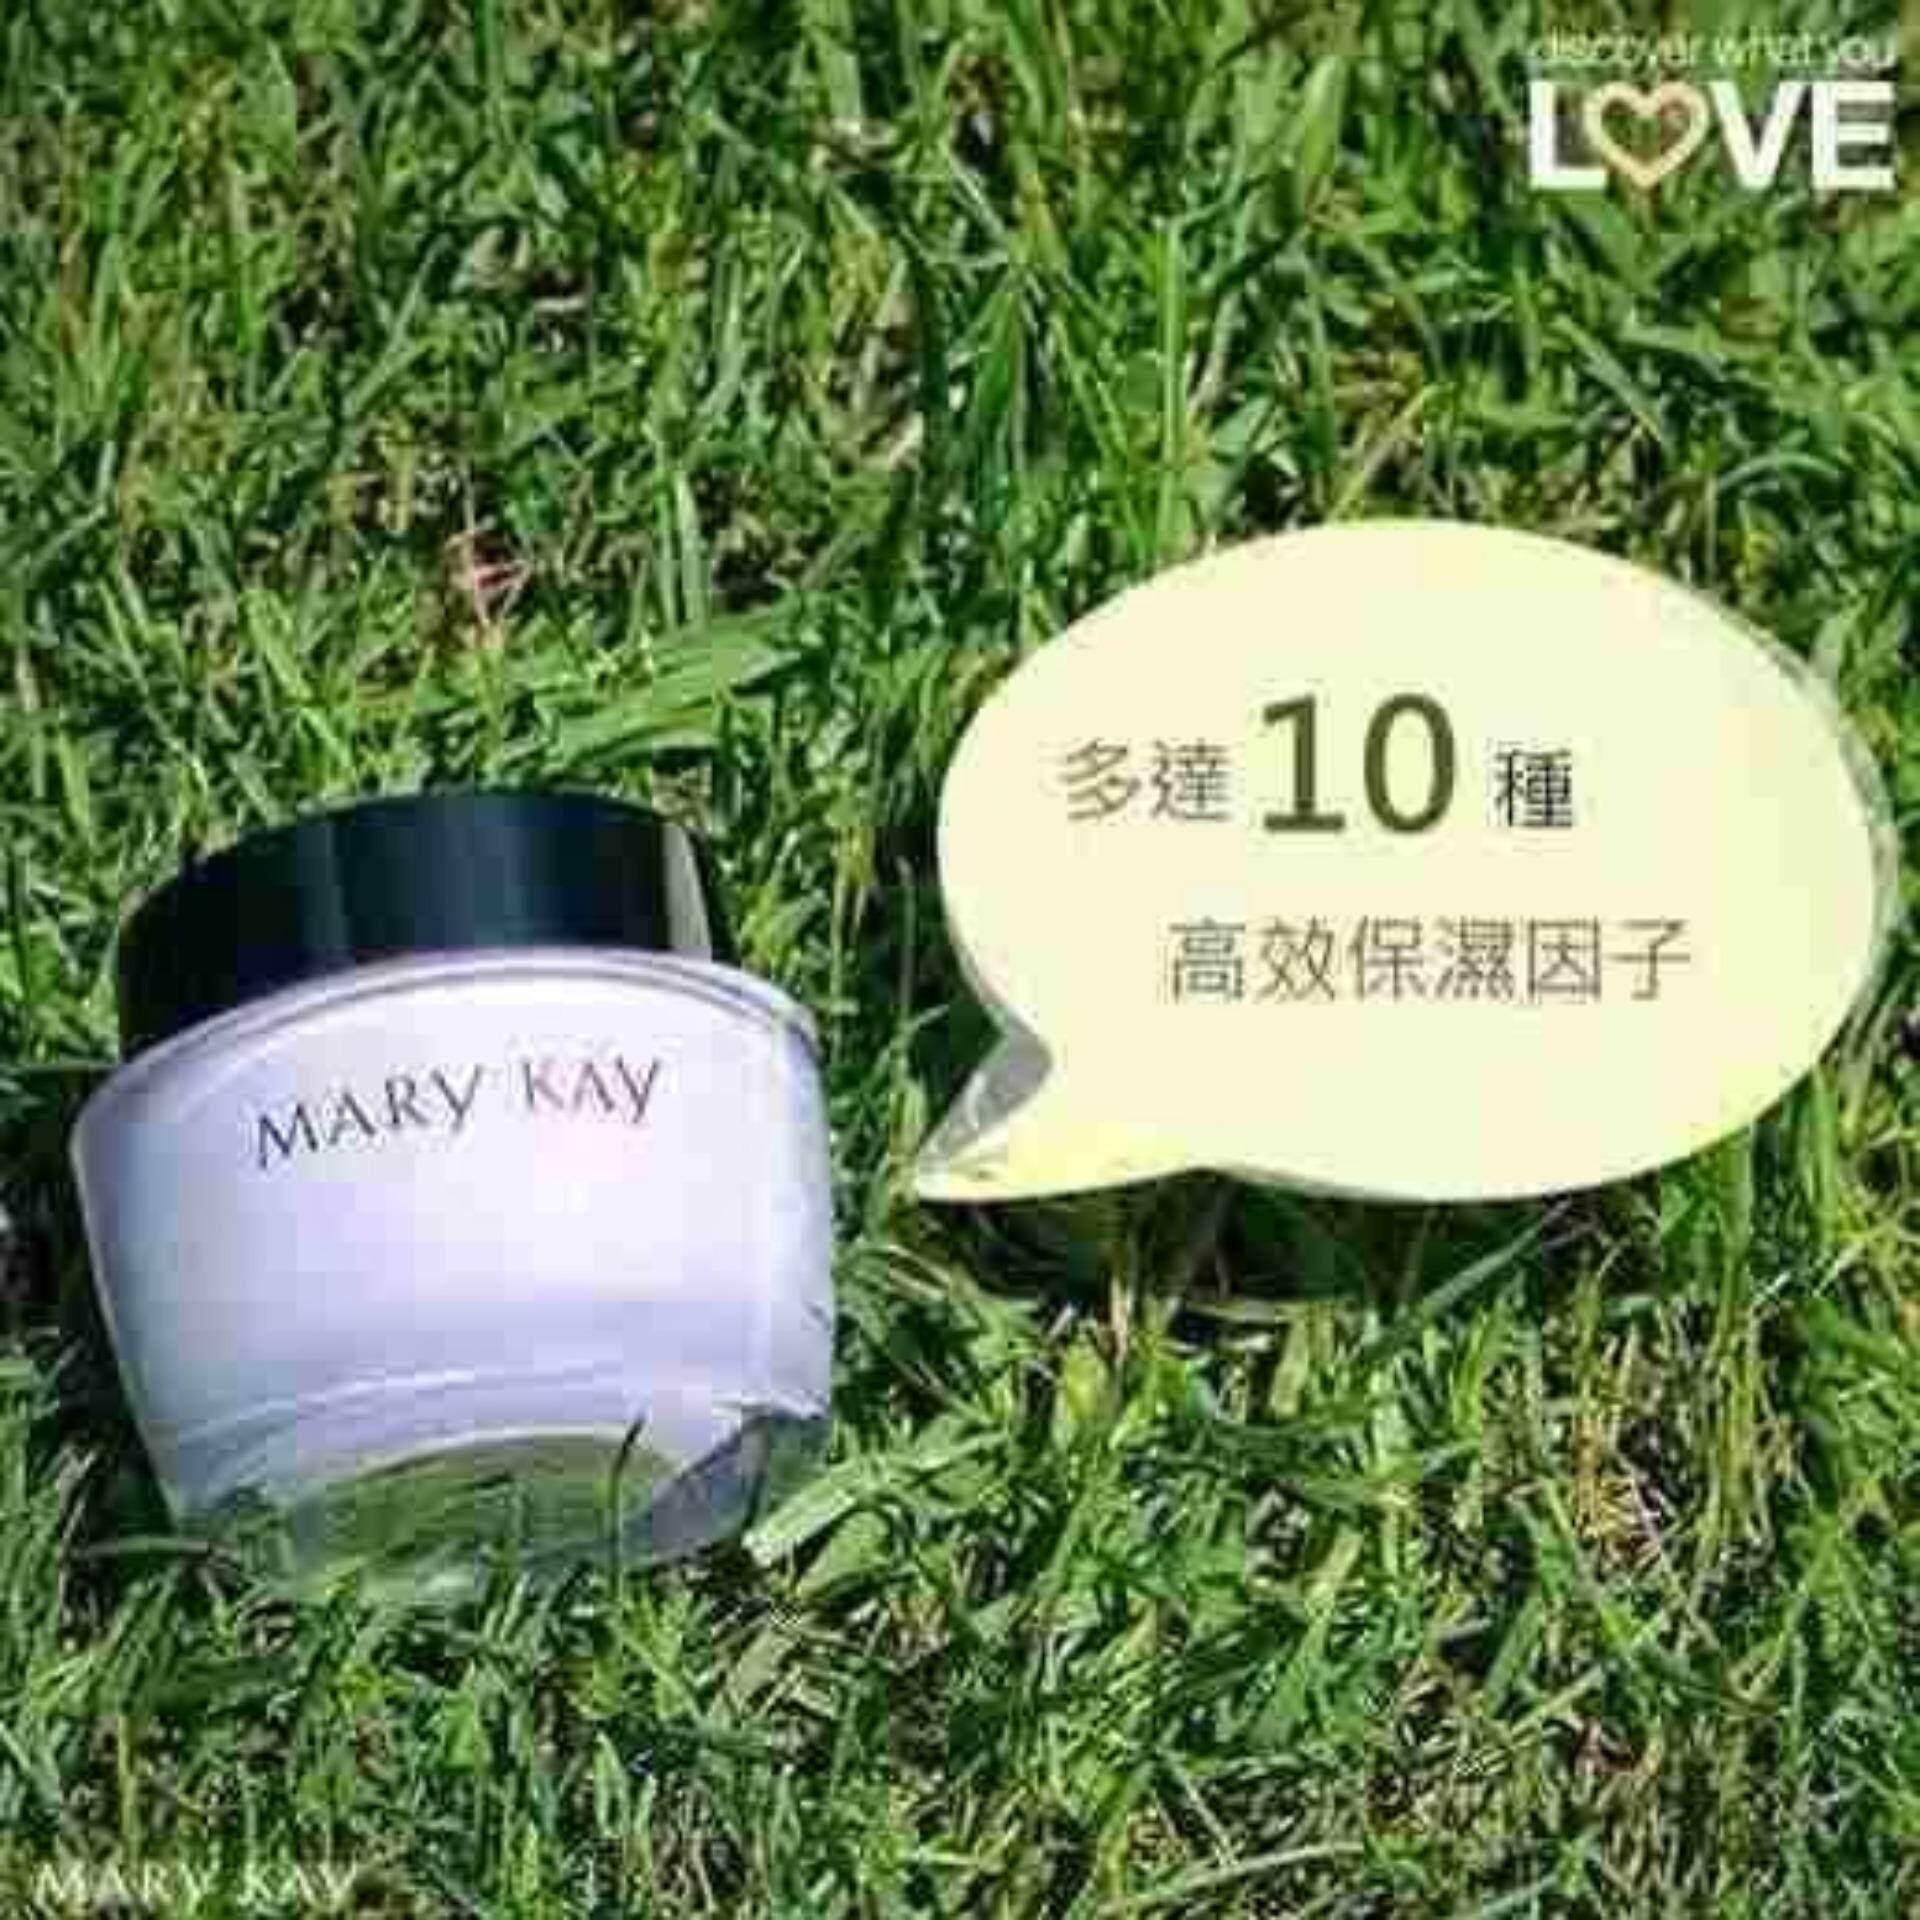 Mary Kay Oil-Free Hydrating Gel, 51g